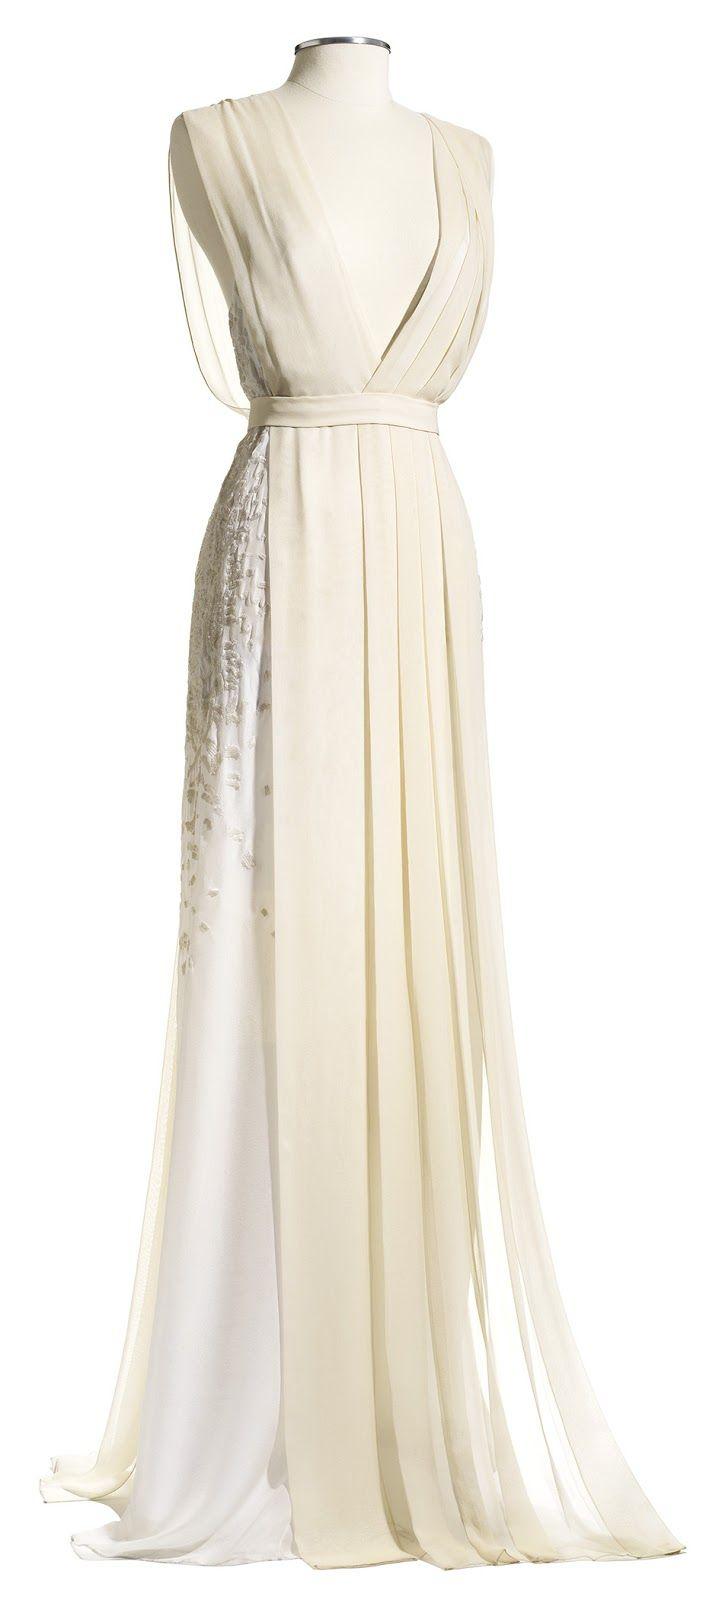 j mendel bridal j mendel wedding dress the cinderella project because every girl deserves a happily ever after J Mendel BridalPretty White